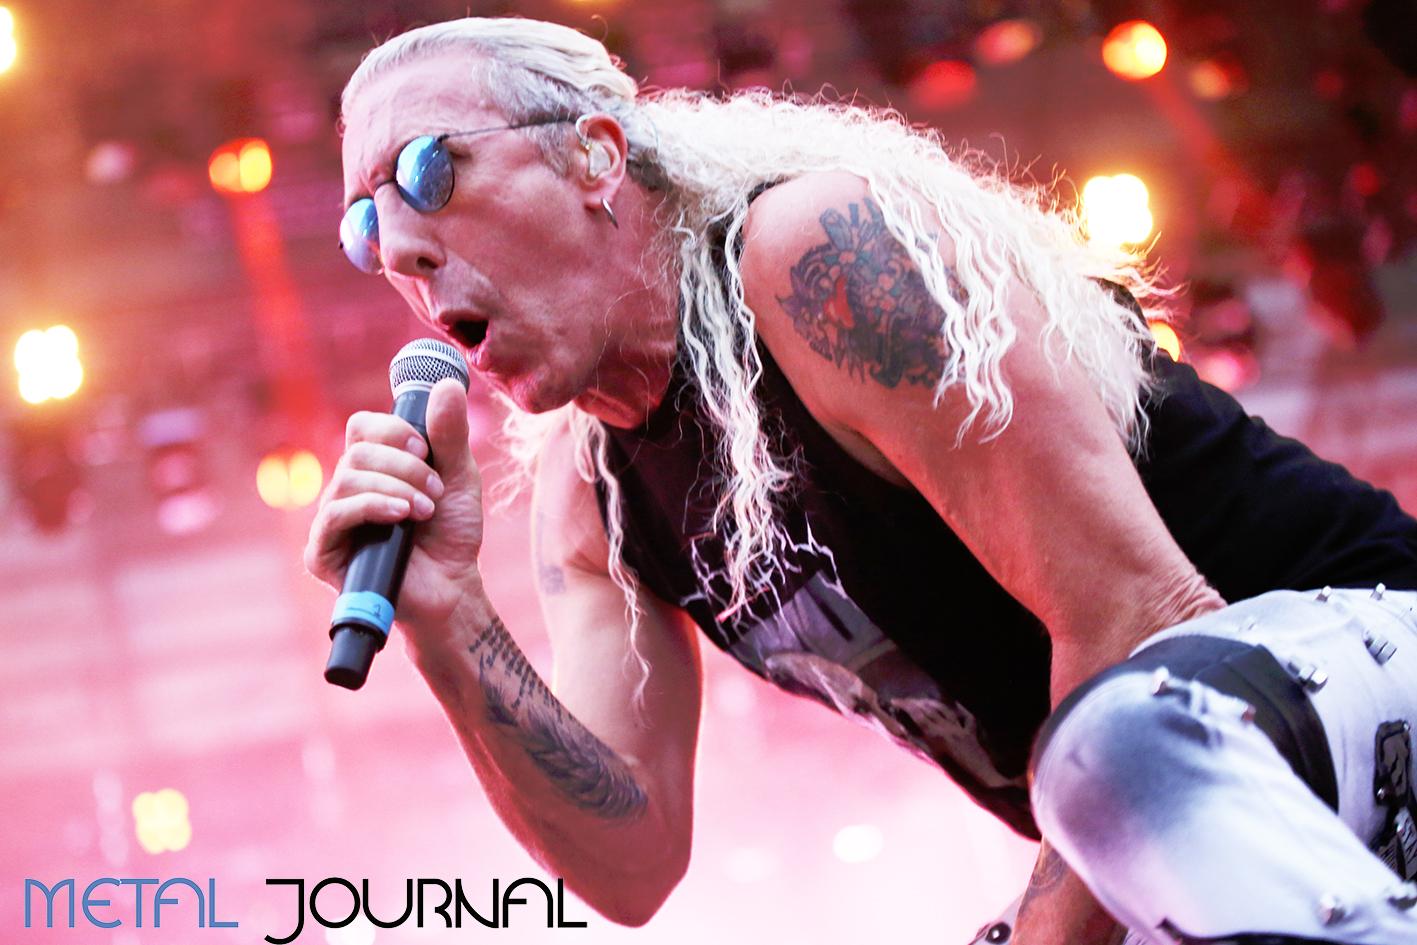 dee snider - metal journal rock fest barcelona 2019 pic 3